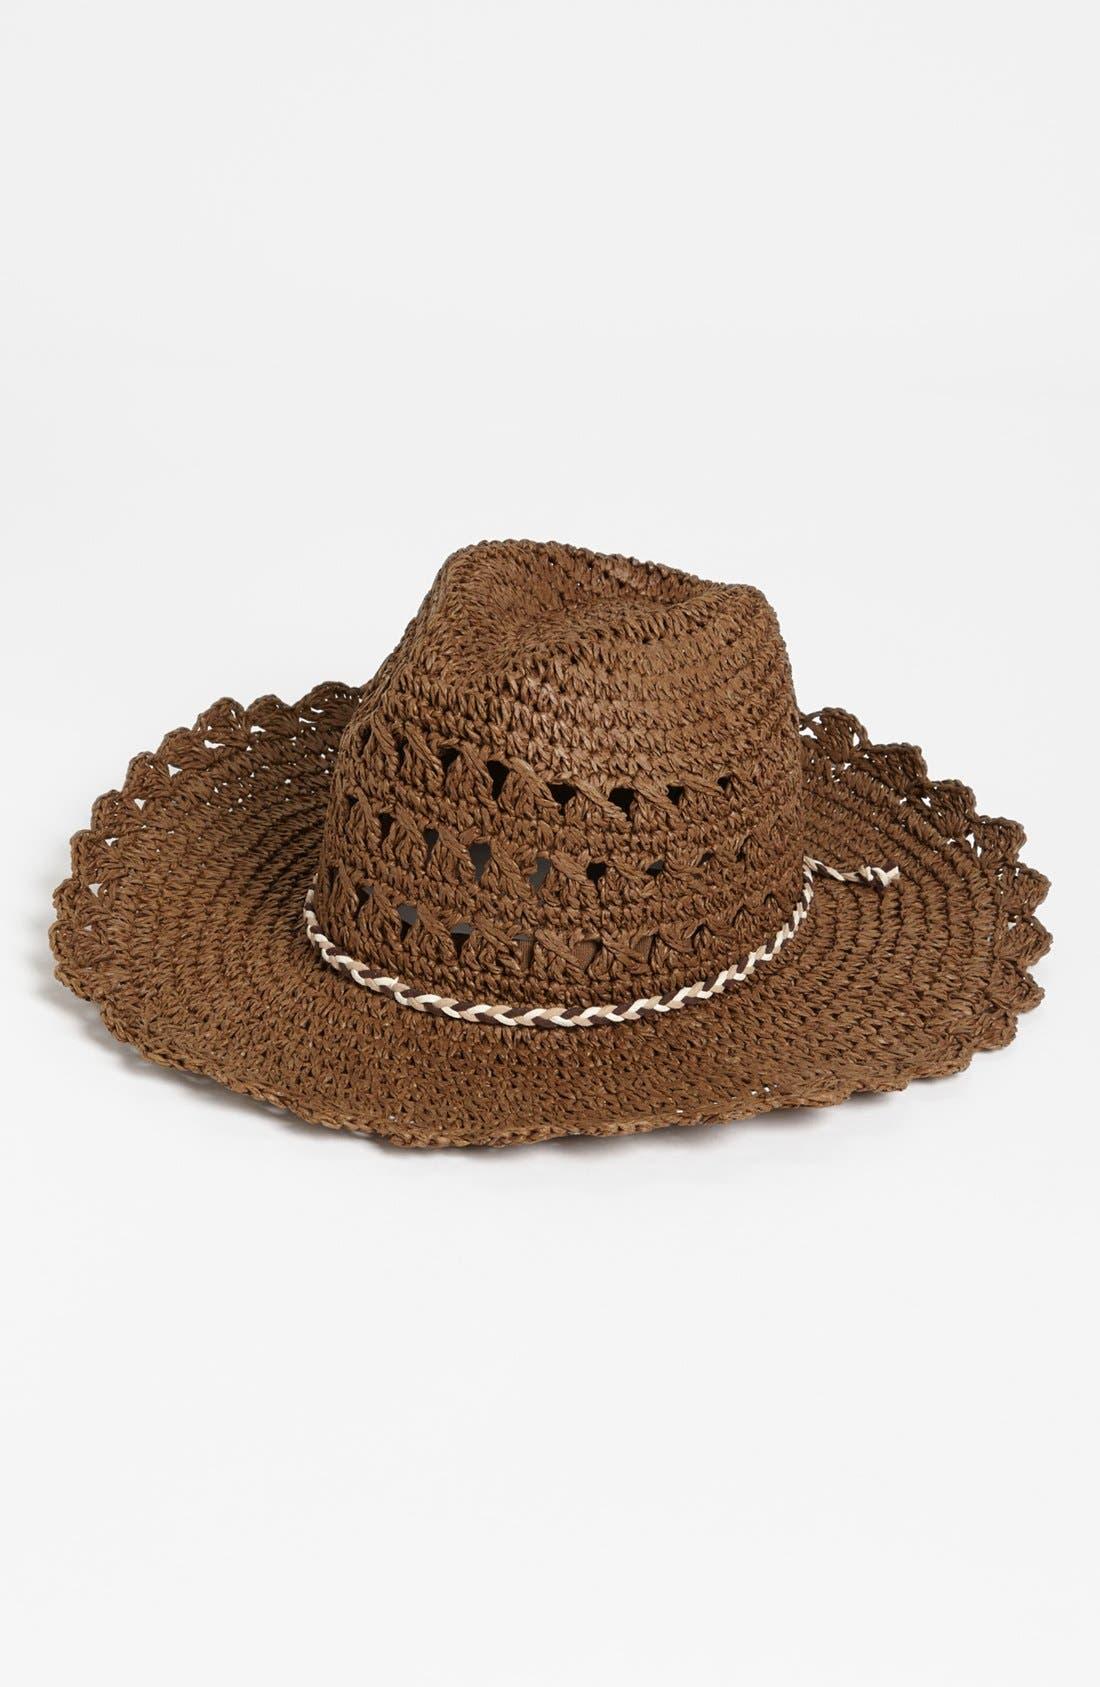 Alternate Image 1 Selected - Tarnish Crochet Cowboy Hat